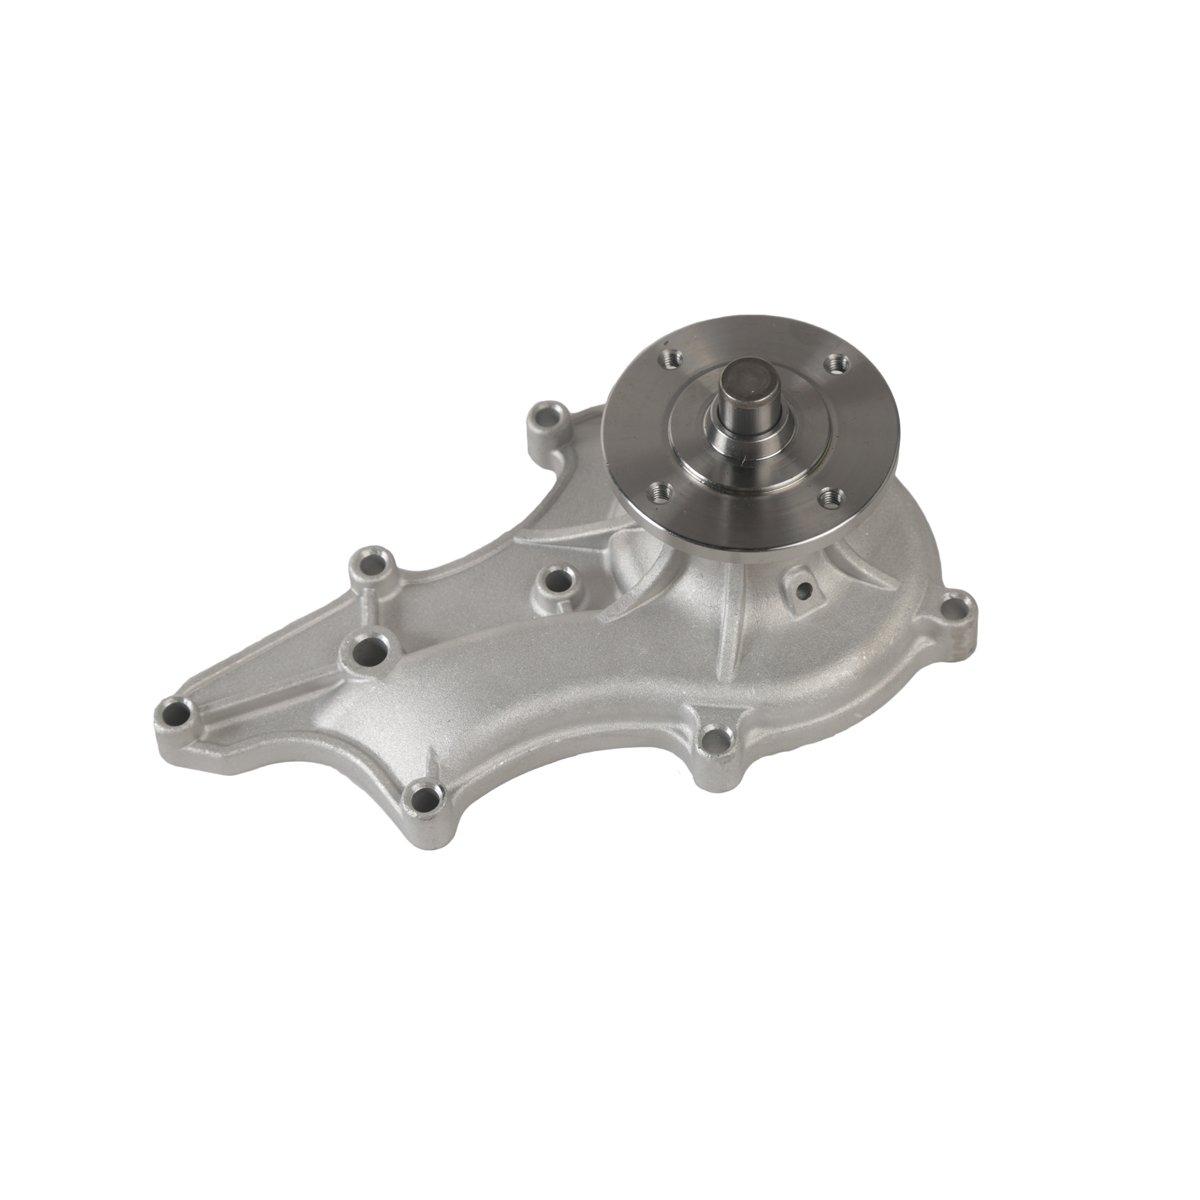 OAW T1410 Water Pump for 78-84 Toyota Celica 4Runner Pickup Corona 20R 22R